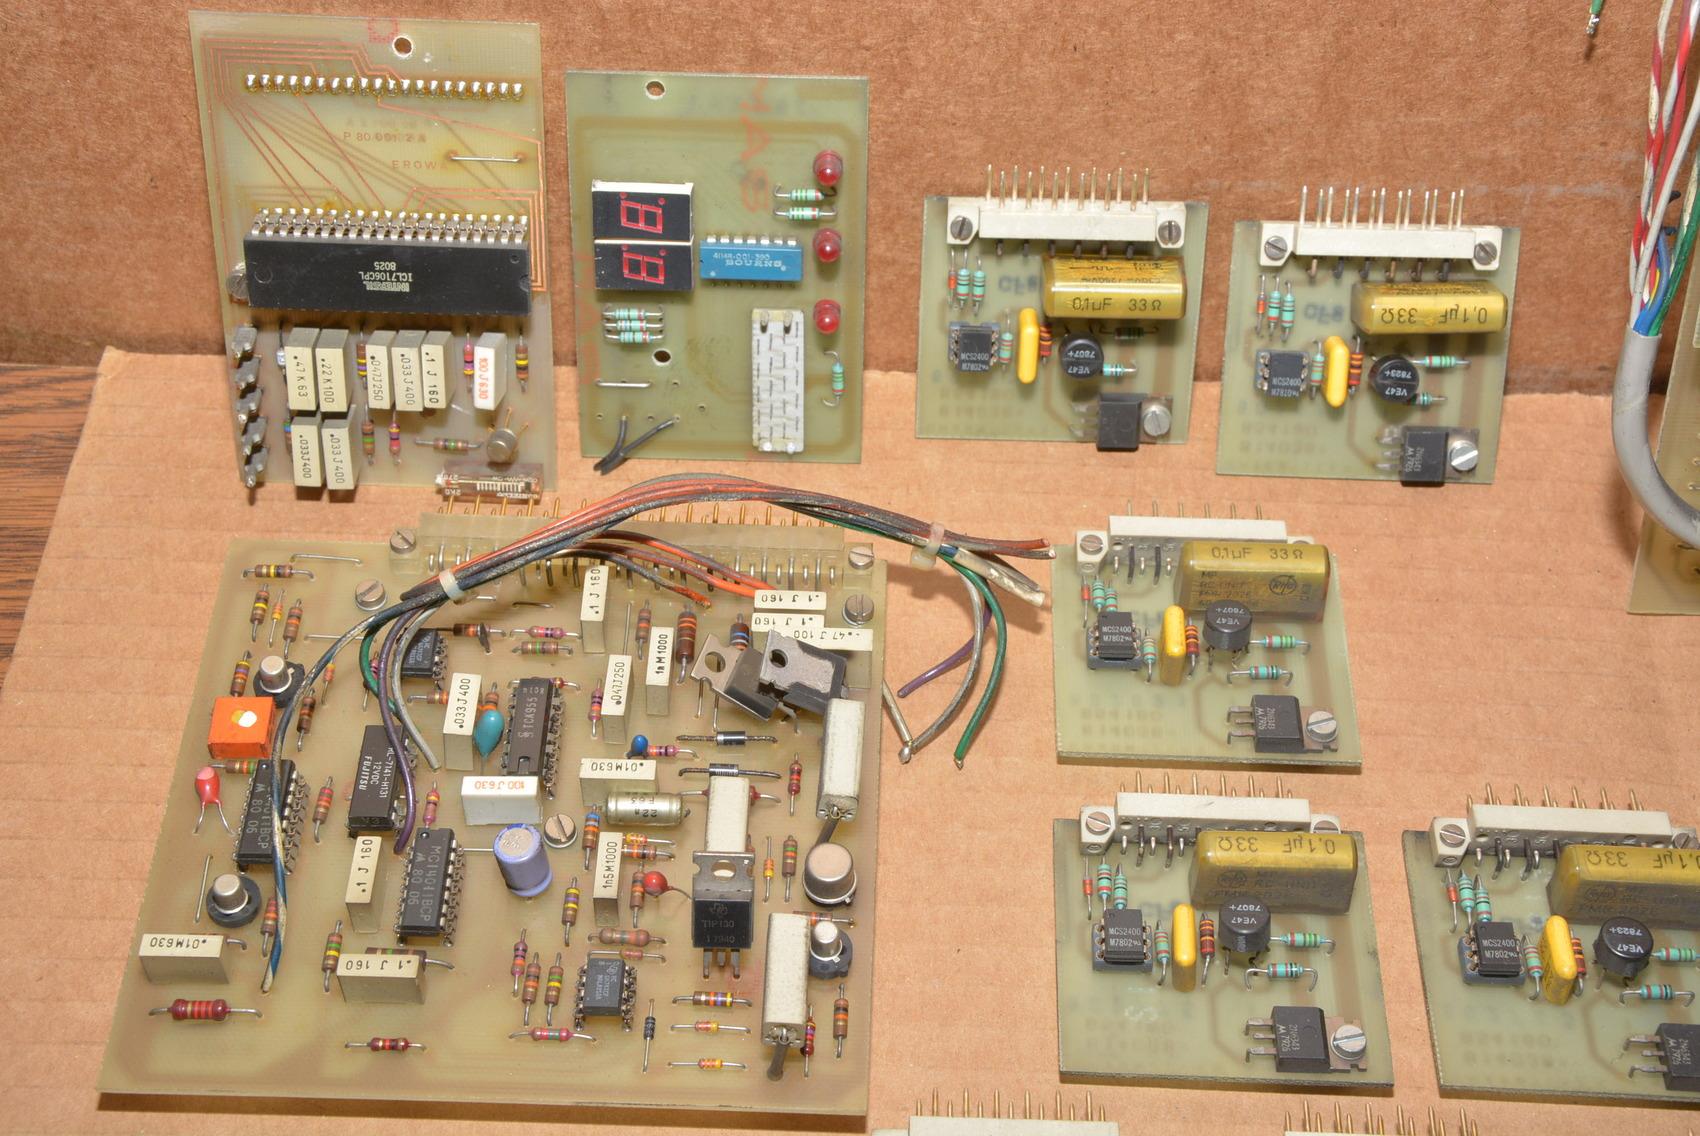 19charmilles Erowa E 200 Eg50 Edm Control Pcb Boards Inv13887 Ebay Printed Wiring 19 Charmilles